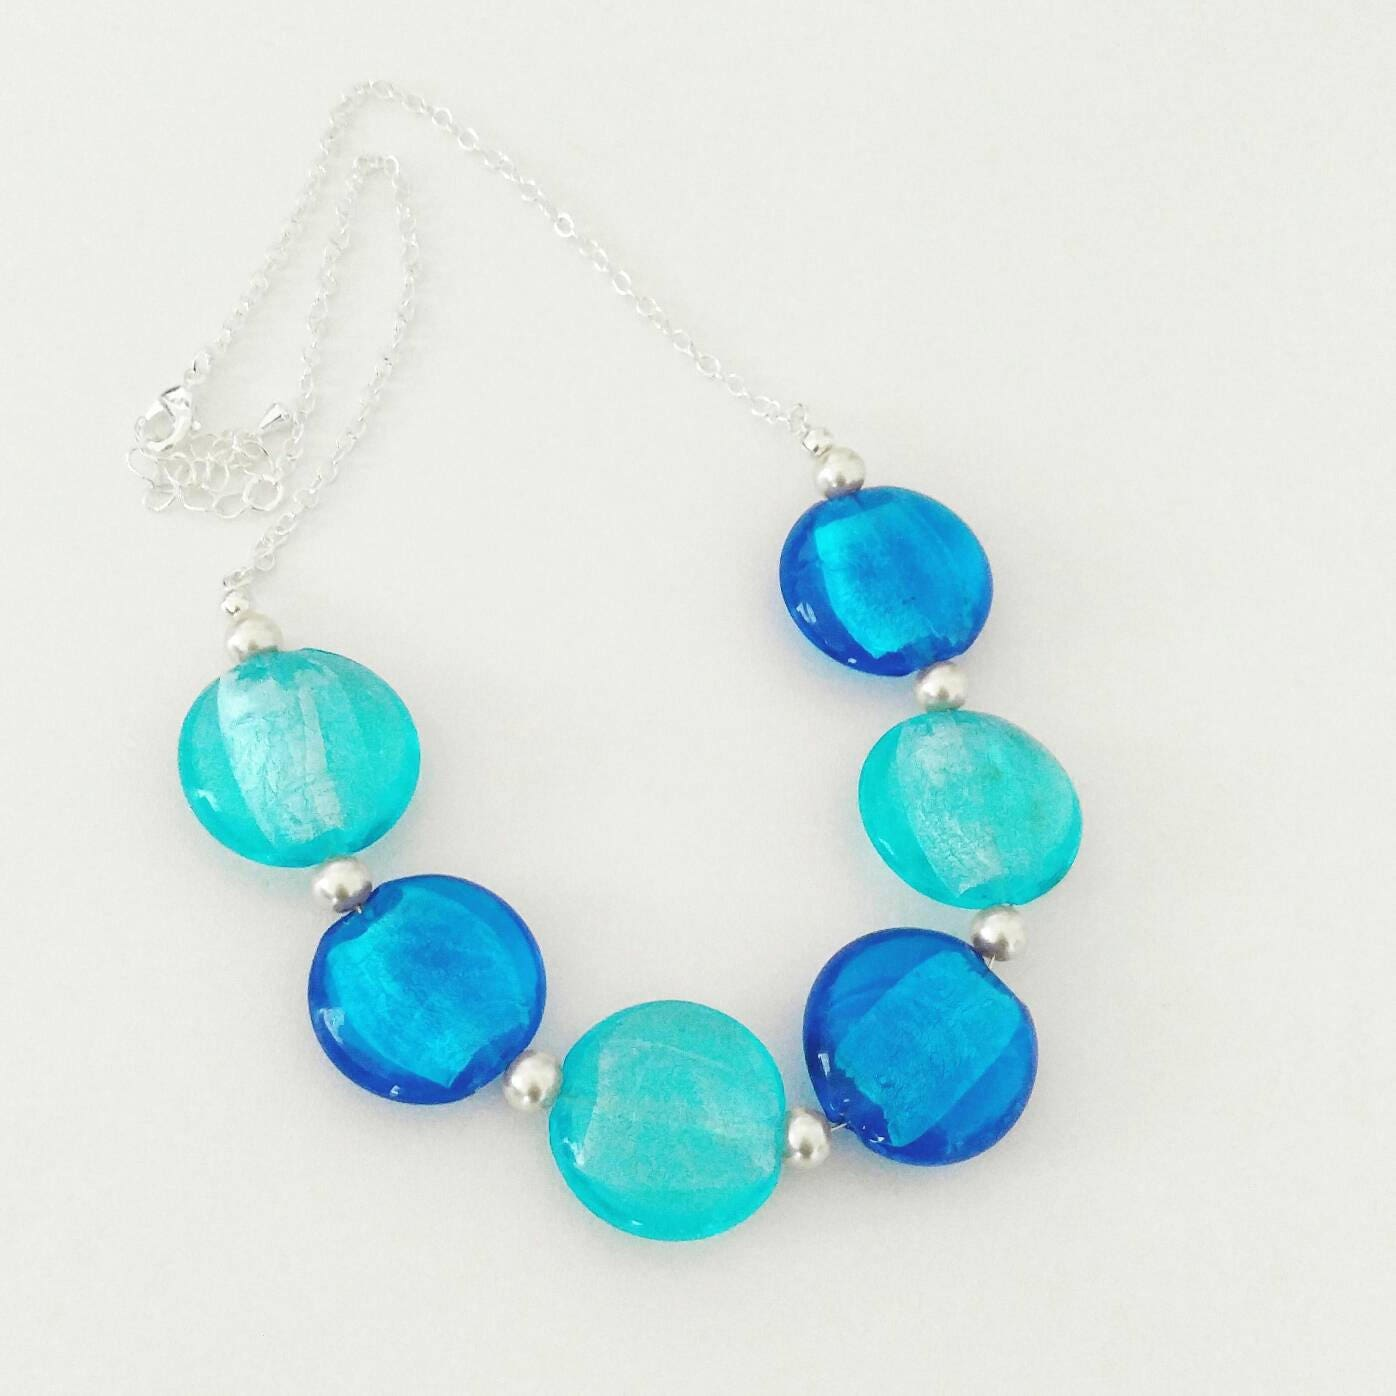 Handmade Beaded Statement Necklace,Blue Glass Beads,Pearls,Handmade ...